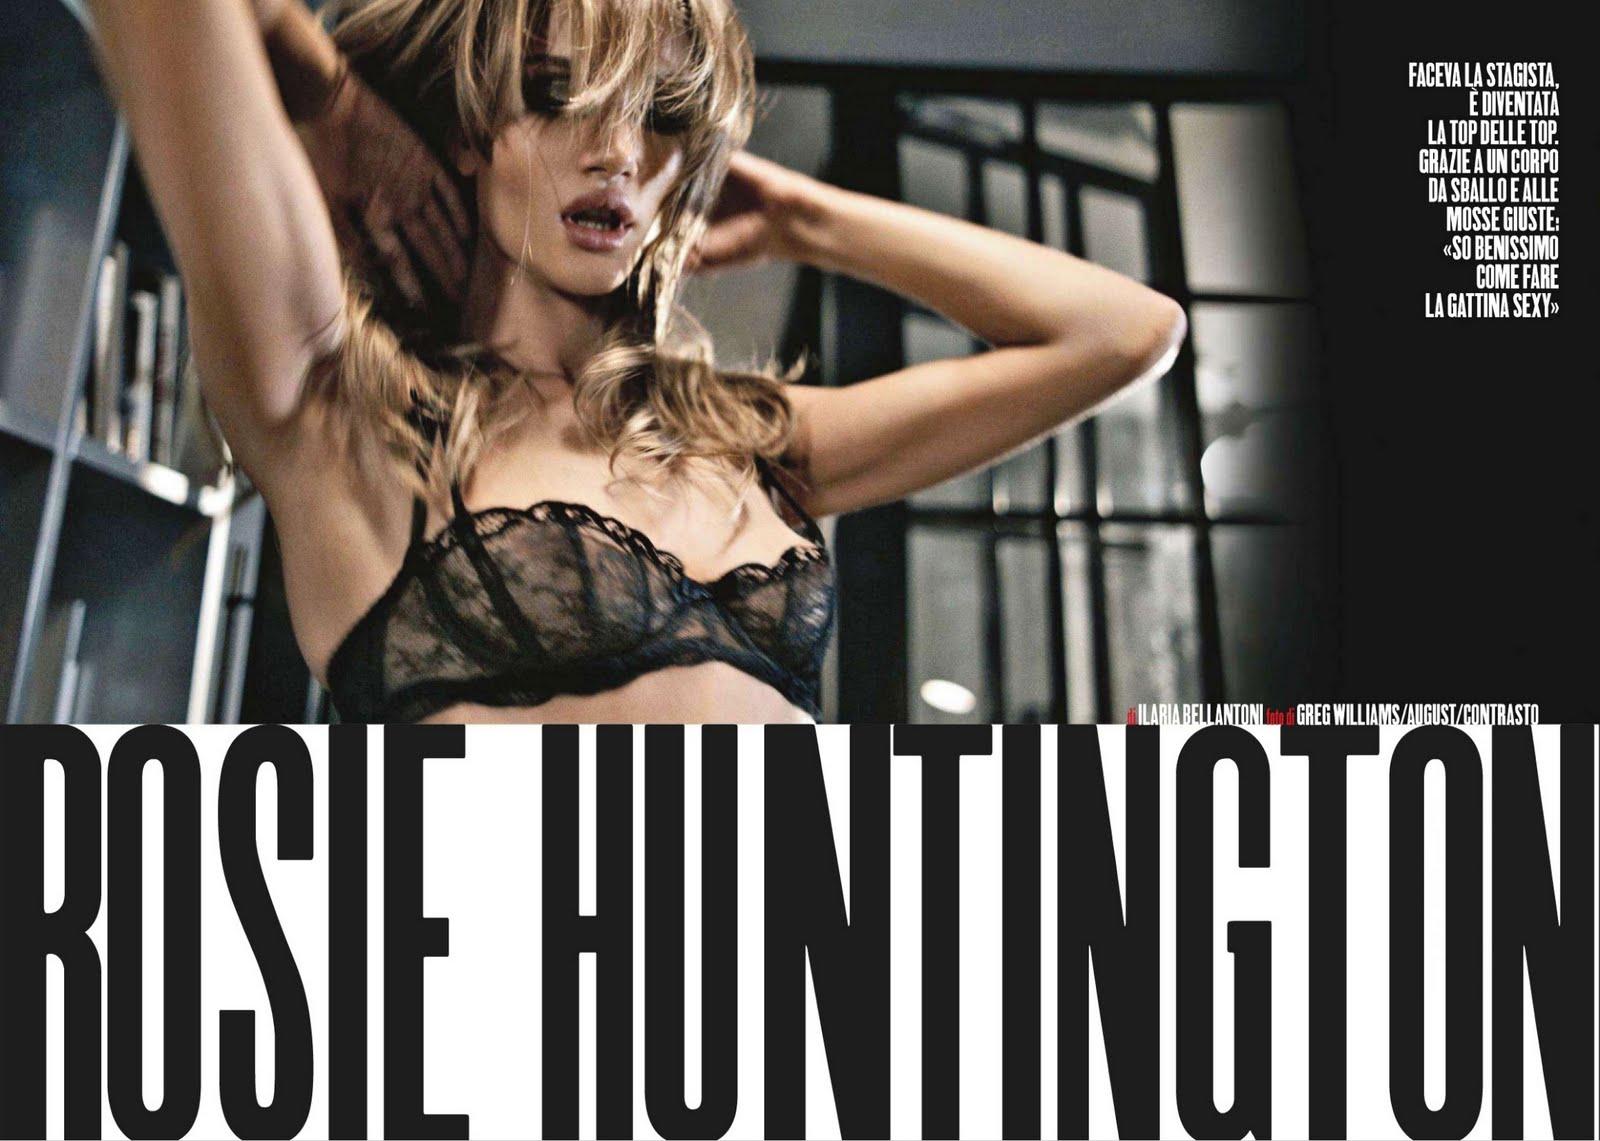 http://2.bp.blogspot.com/_KTqLxxzc3H0/TVKkLFZZV7I/AAAAAAAAS_s/cPCBdDGhqfE/s1600/Rosie-Huntington-Whiteley-5.jpg